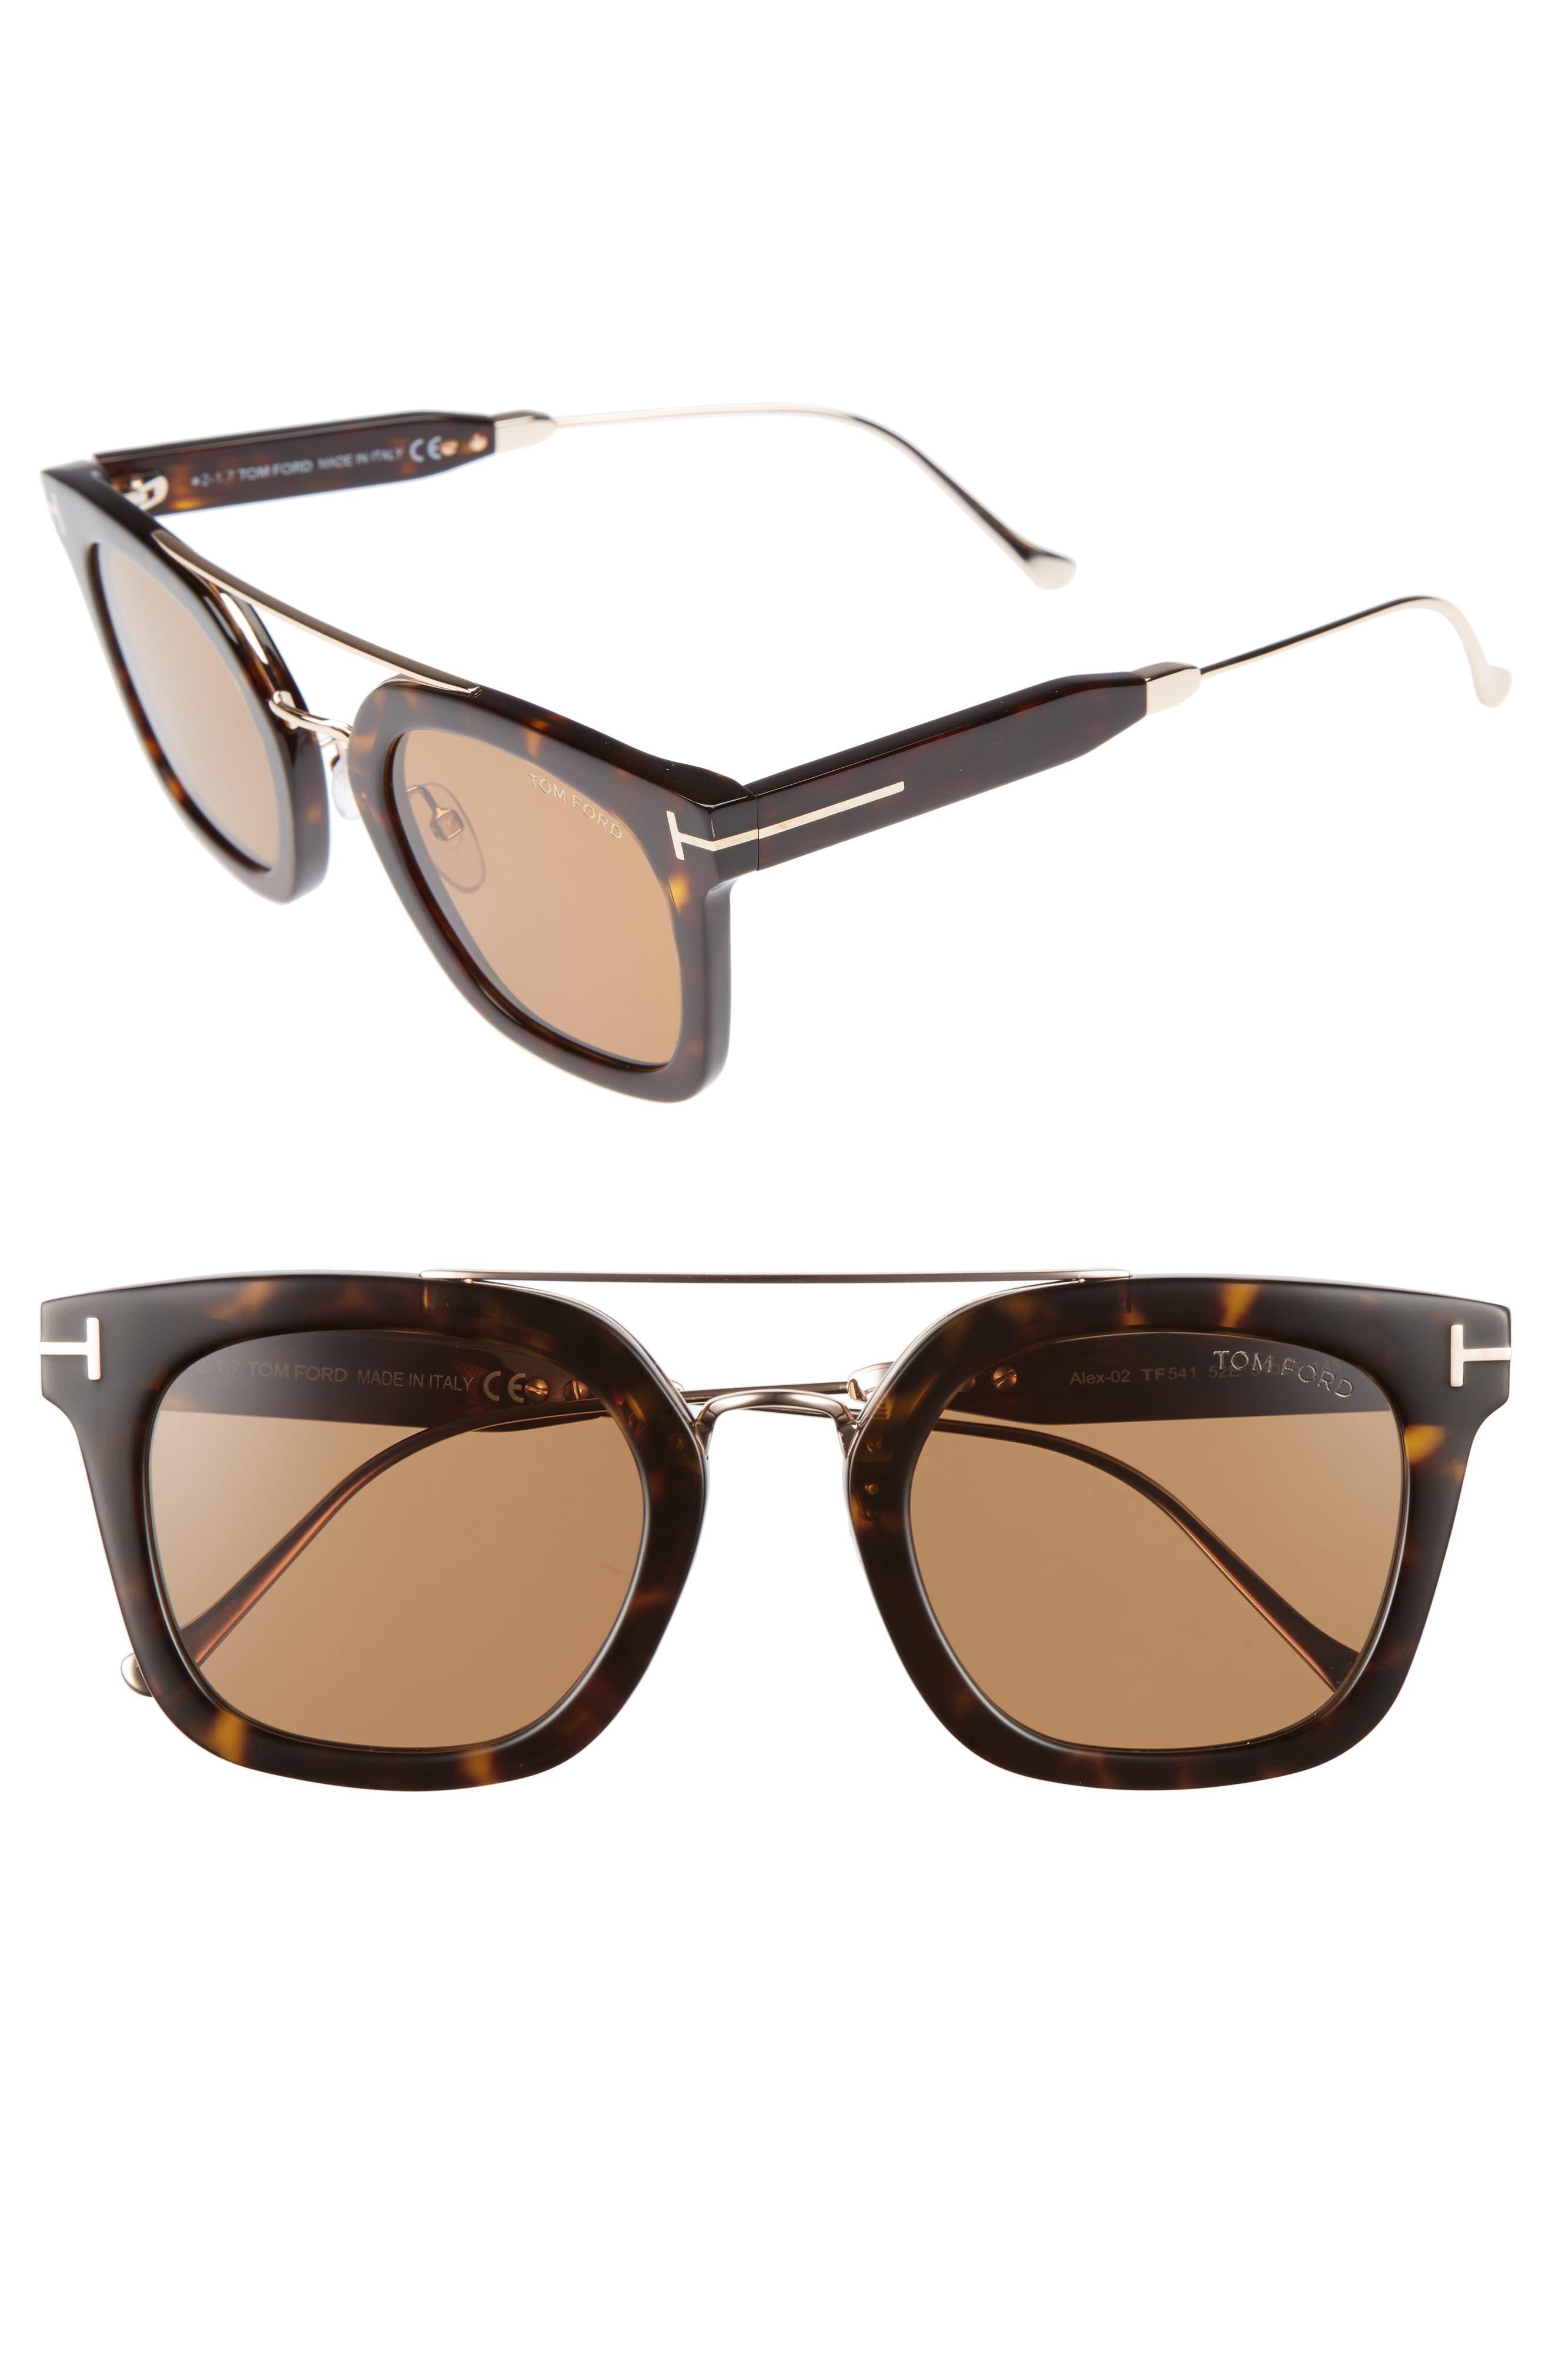 Main Image - Tom Ford Alex 51mm Sunglasses